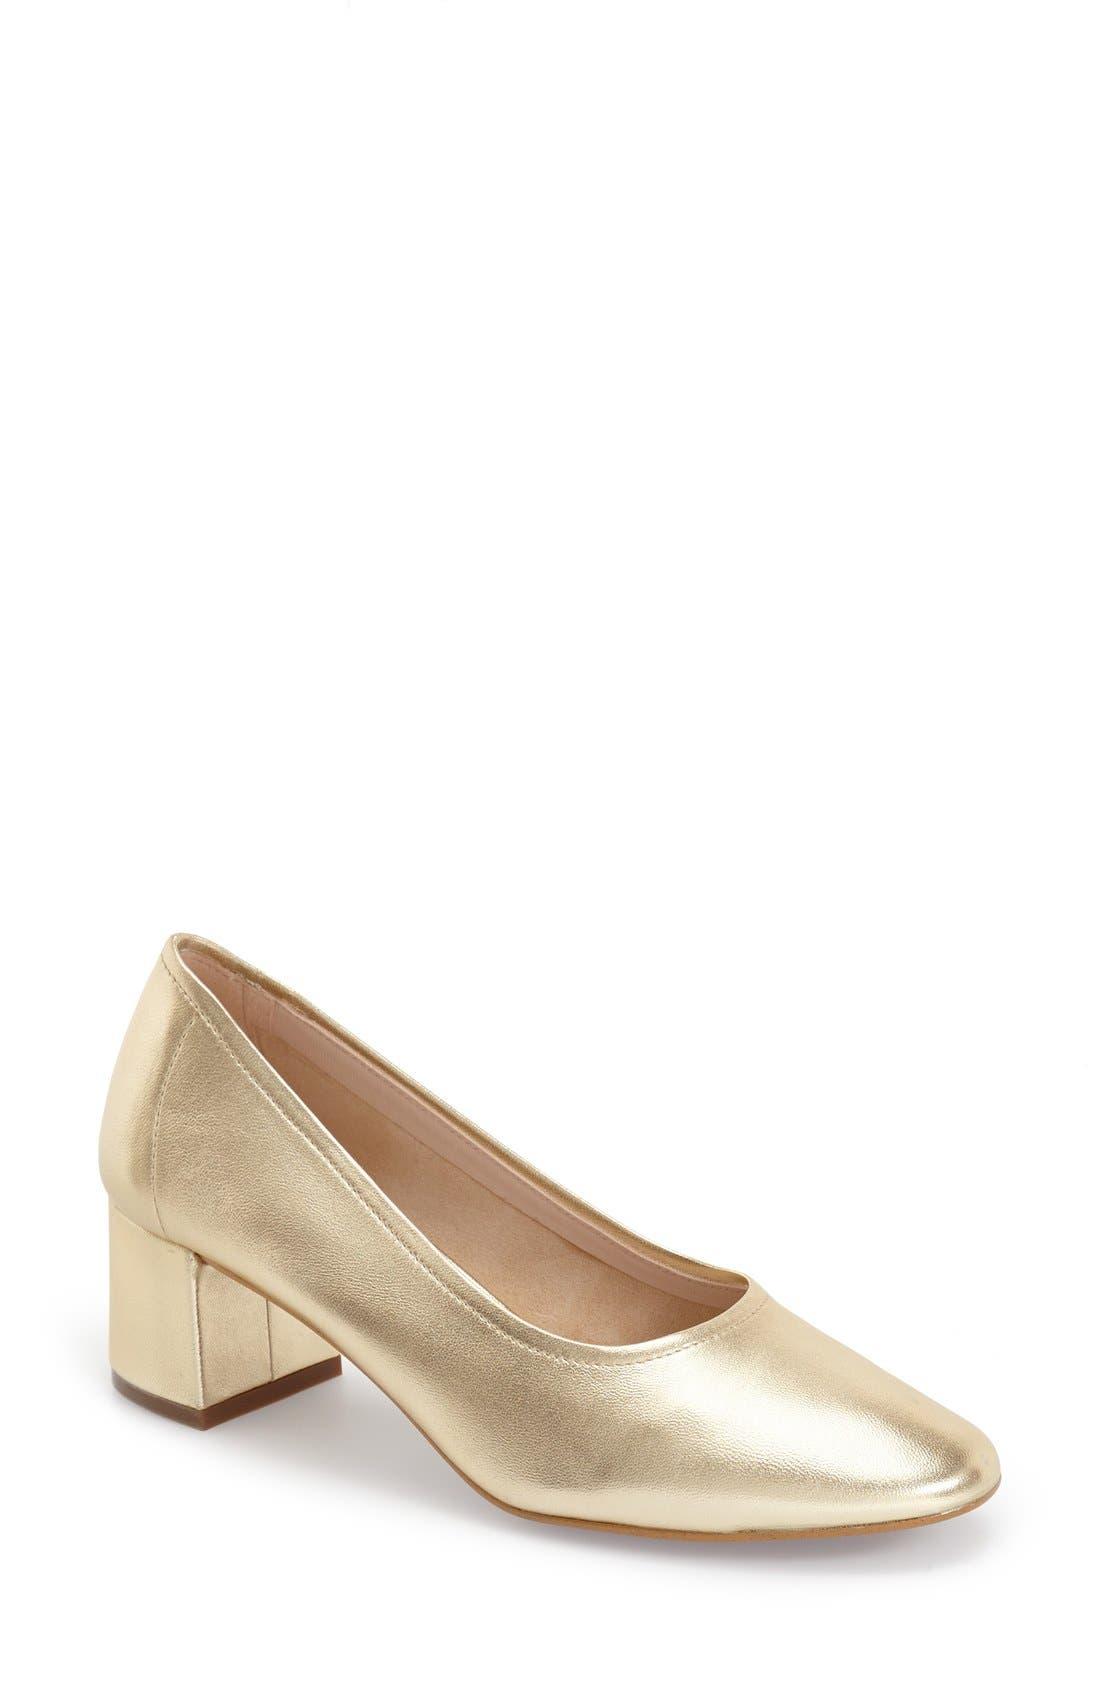 'Juno' Ballet Shoe,                             Main thumbnail 1, color,                             710